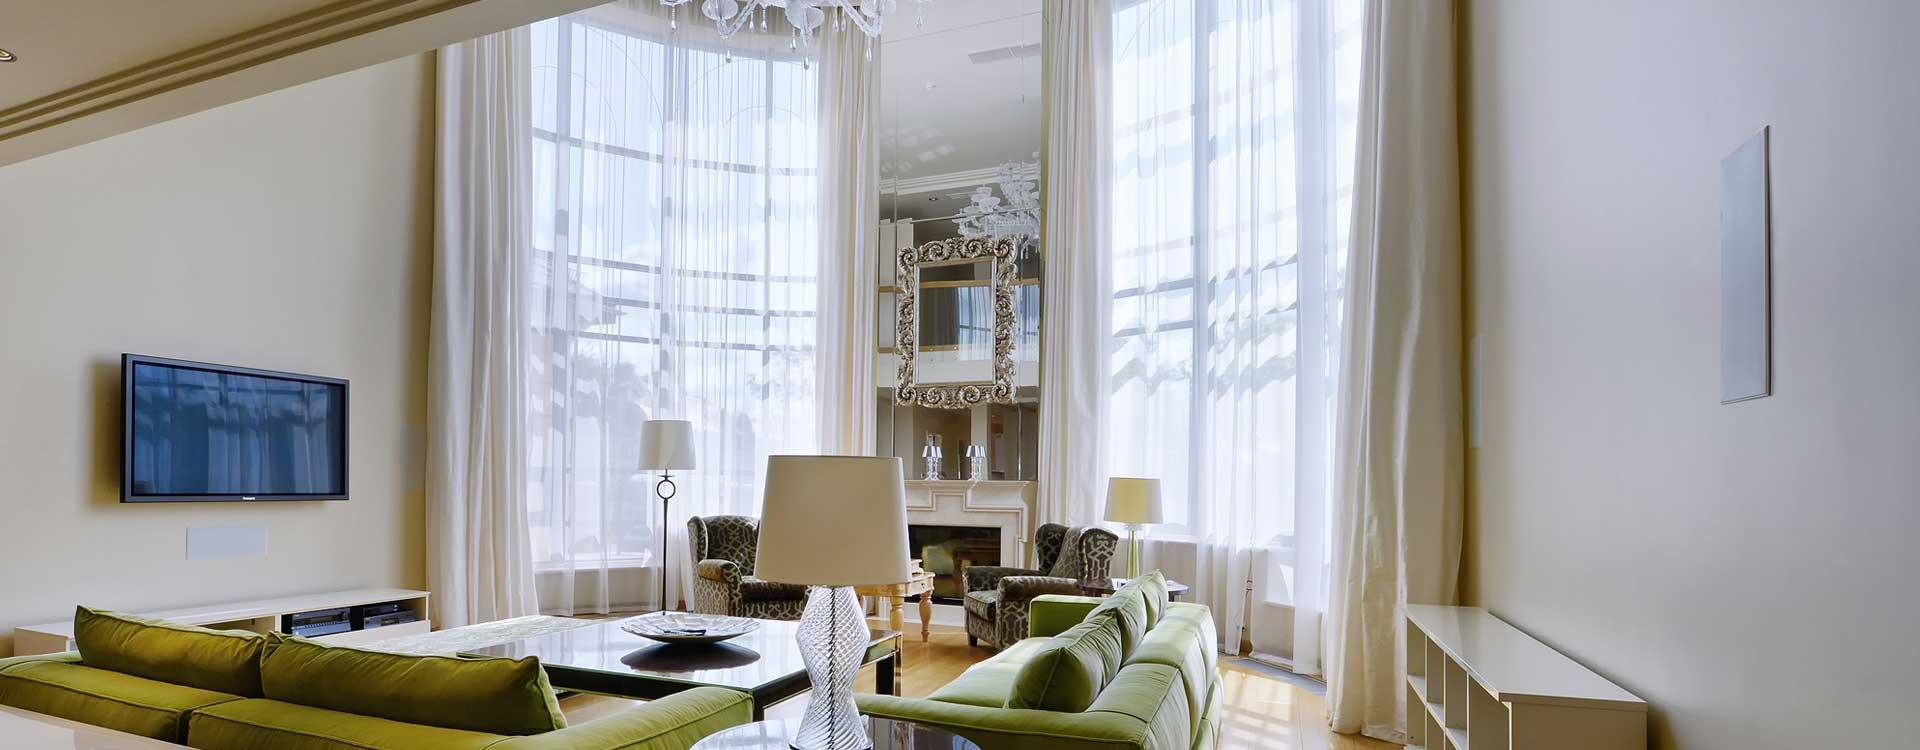 velvet new elm blue curtains best curtain west luster of stone plan drapes and slate regal light